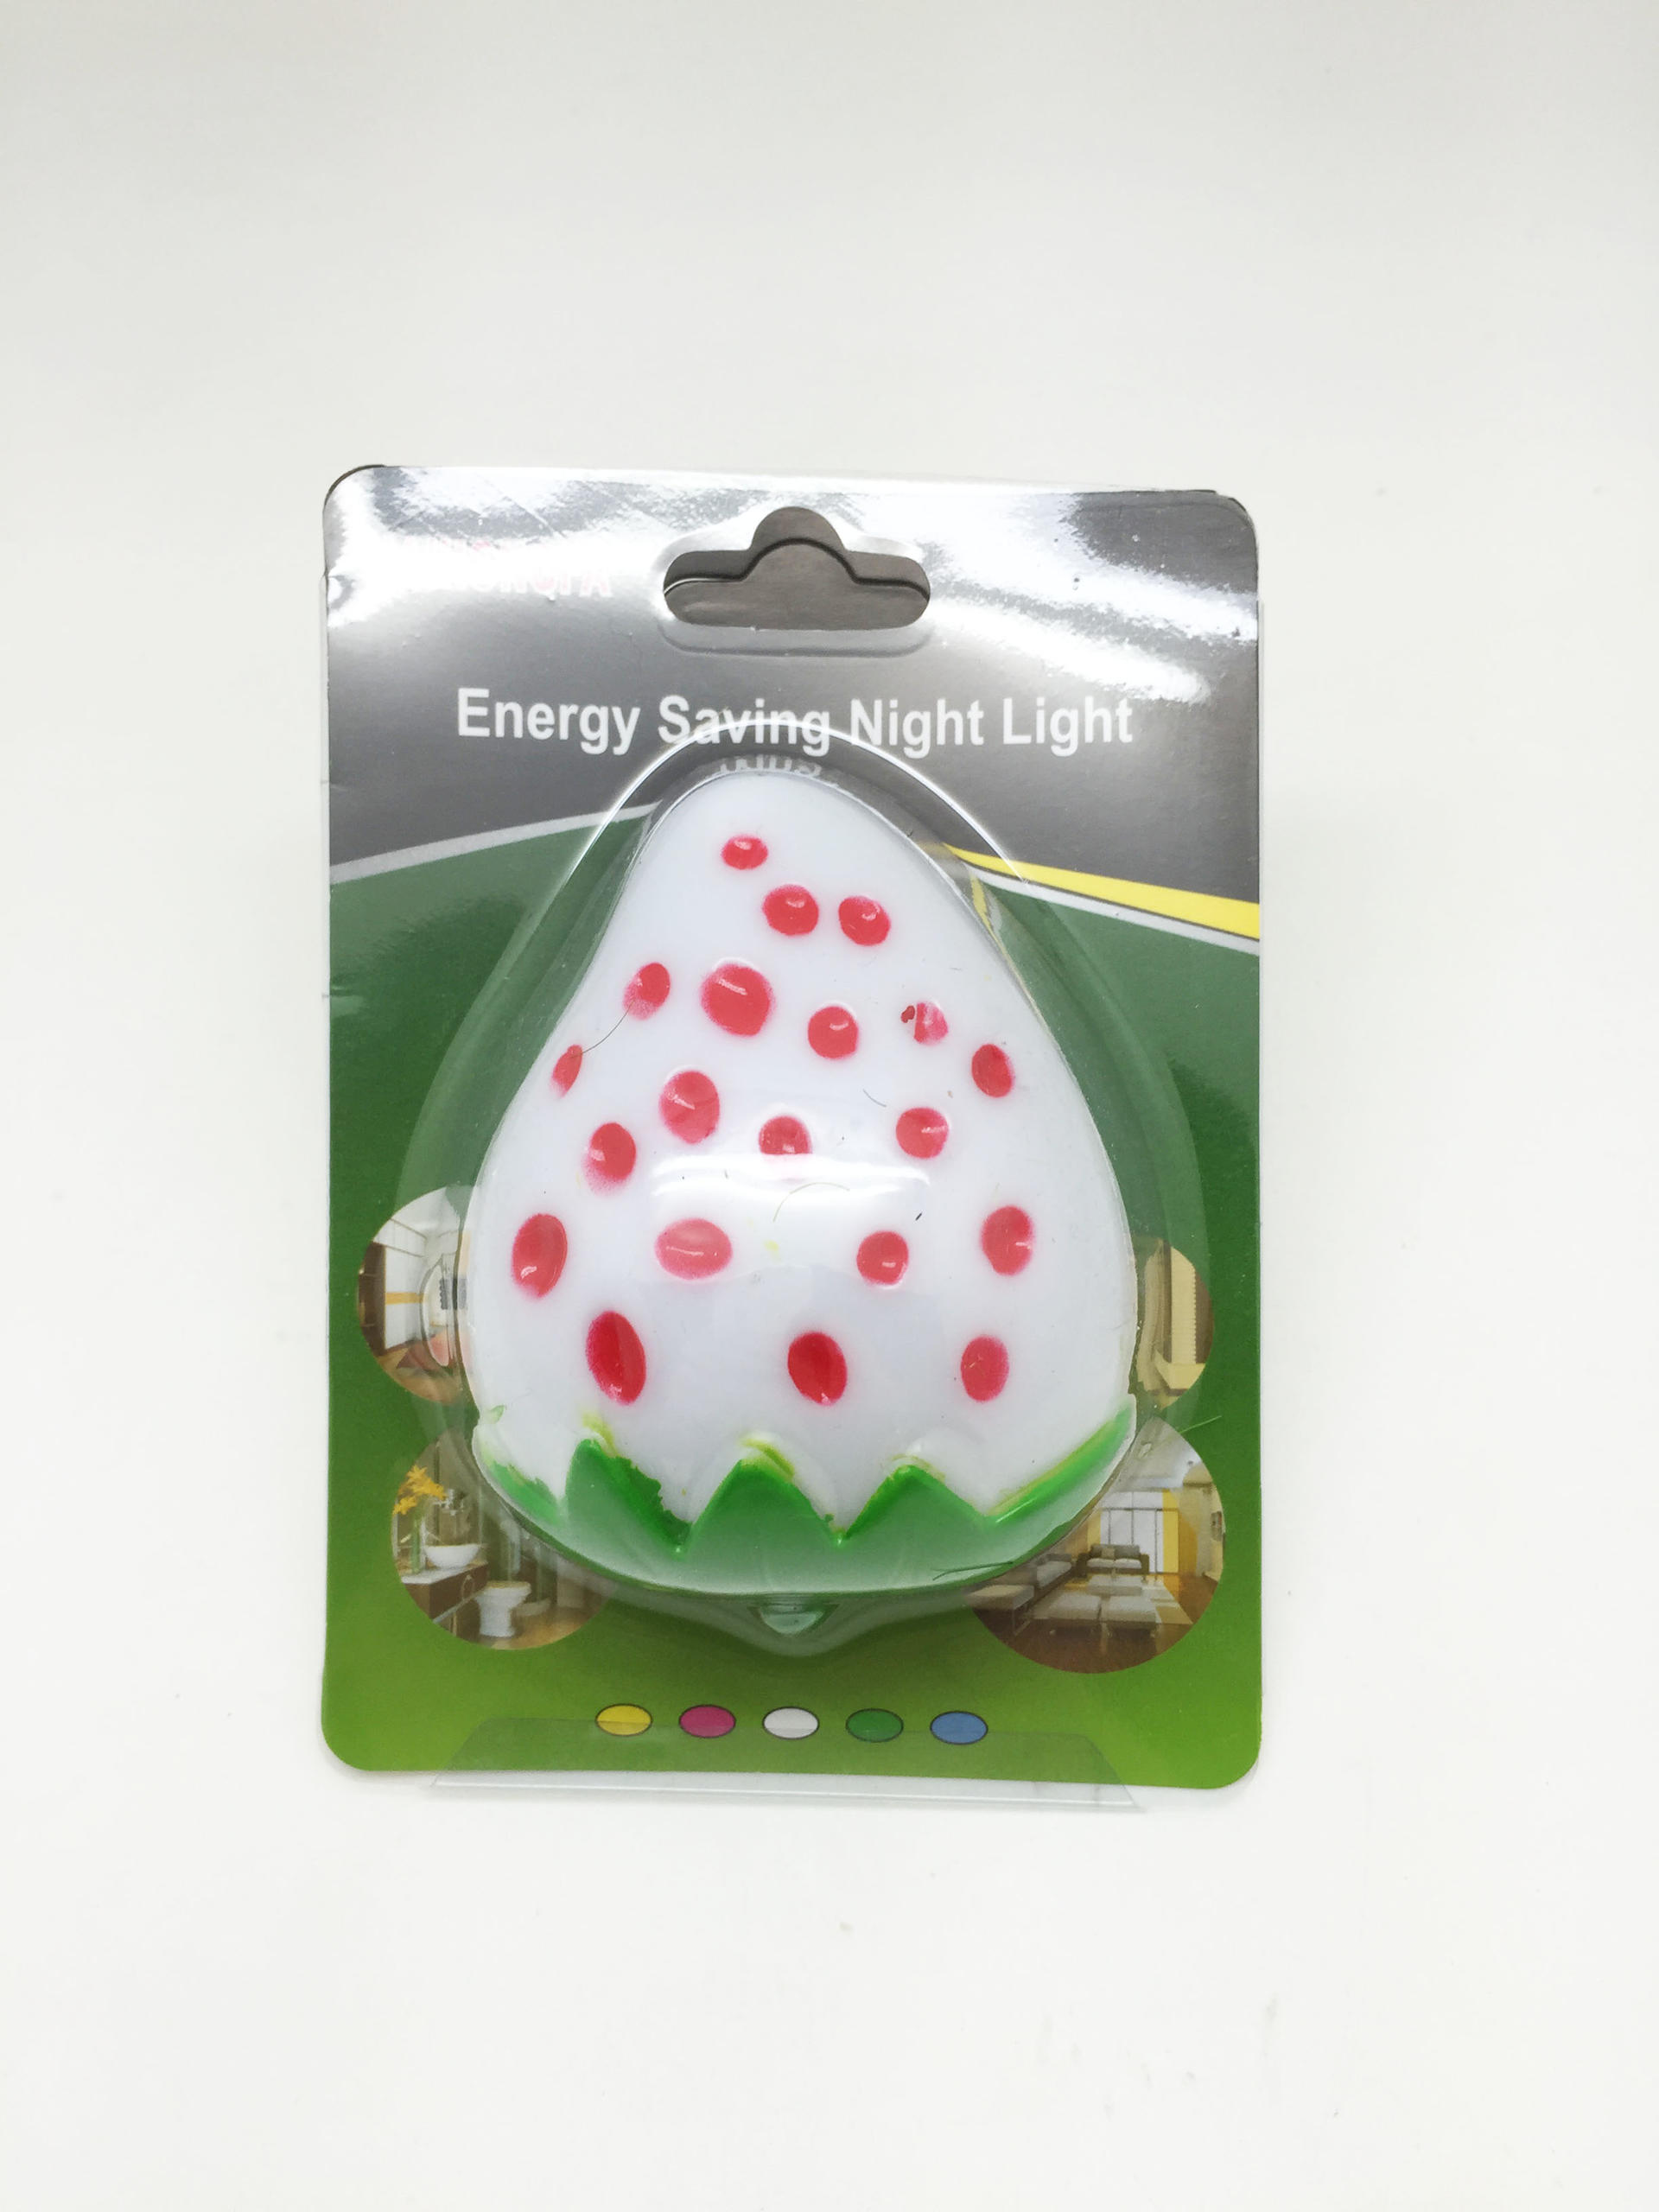 OEM 0.6W and 110V or 220V strawberry fruits shape LED SMD mini switch plug in night light